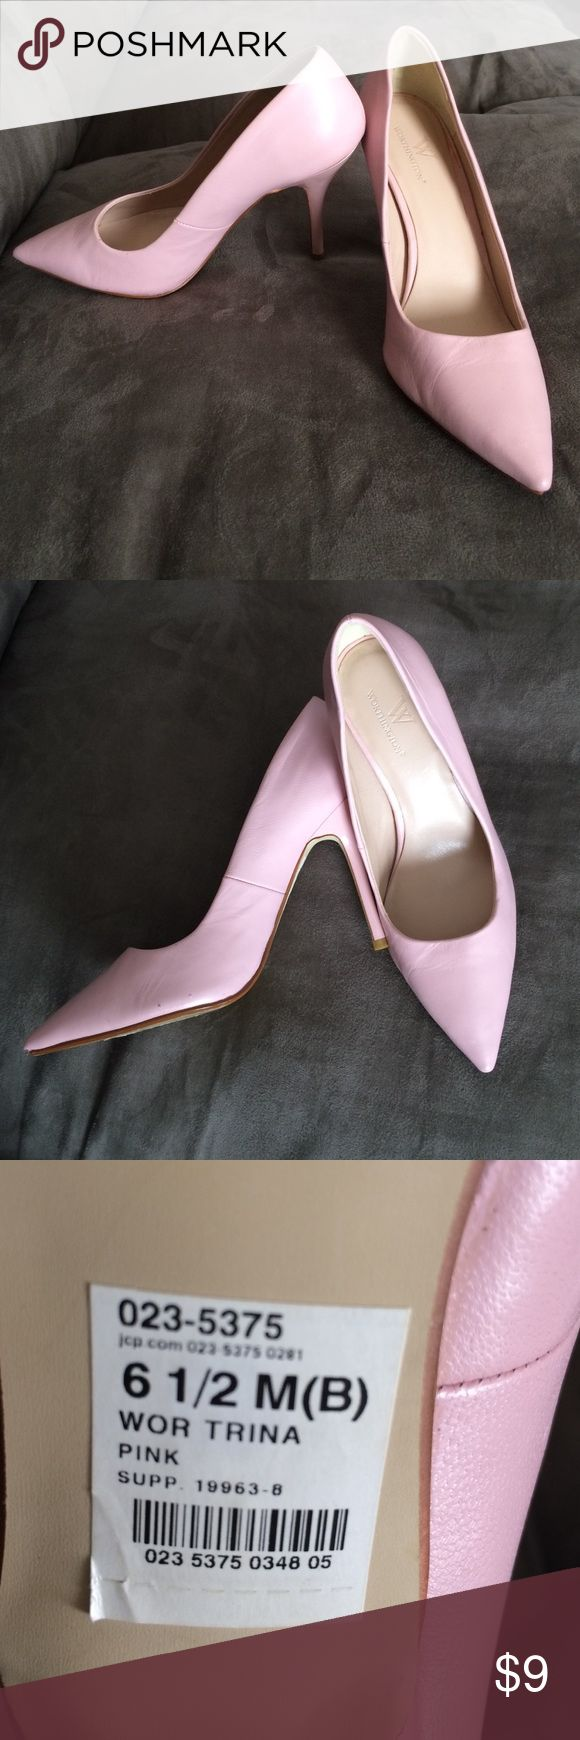 Light pink high heels Light pink heels,size 6.5, Worthington brand, worn only a couple time. Worthington Shoes Heels